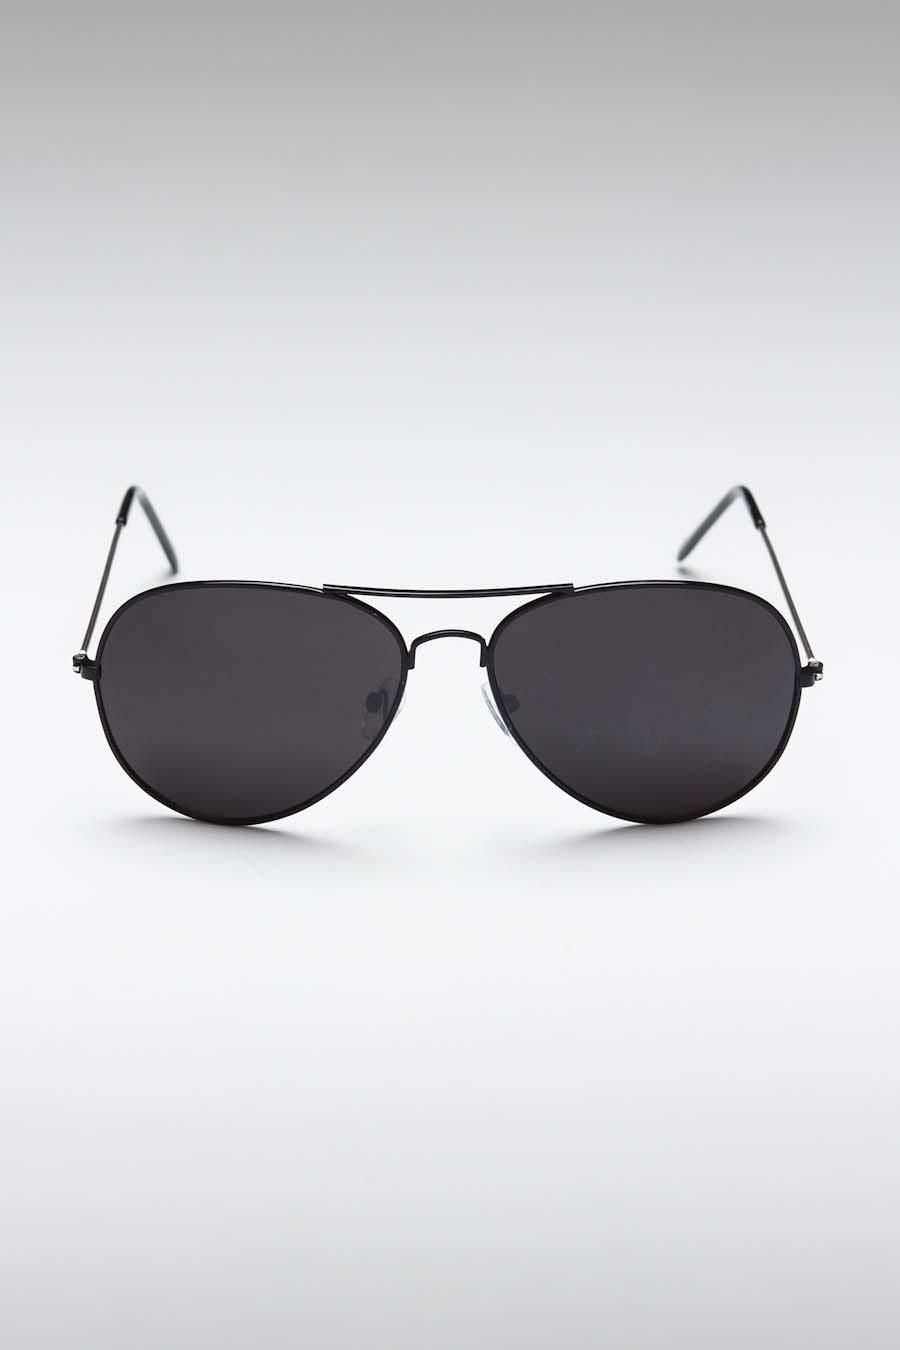 24eb5608af Ray-Ban Original Aviator Polarized Sunglasses---- Only the best.  VonMaur